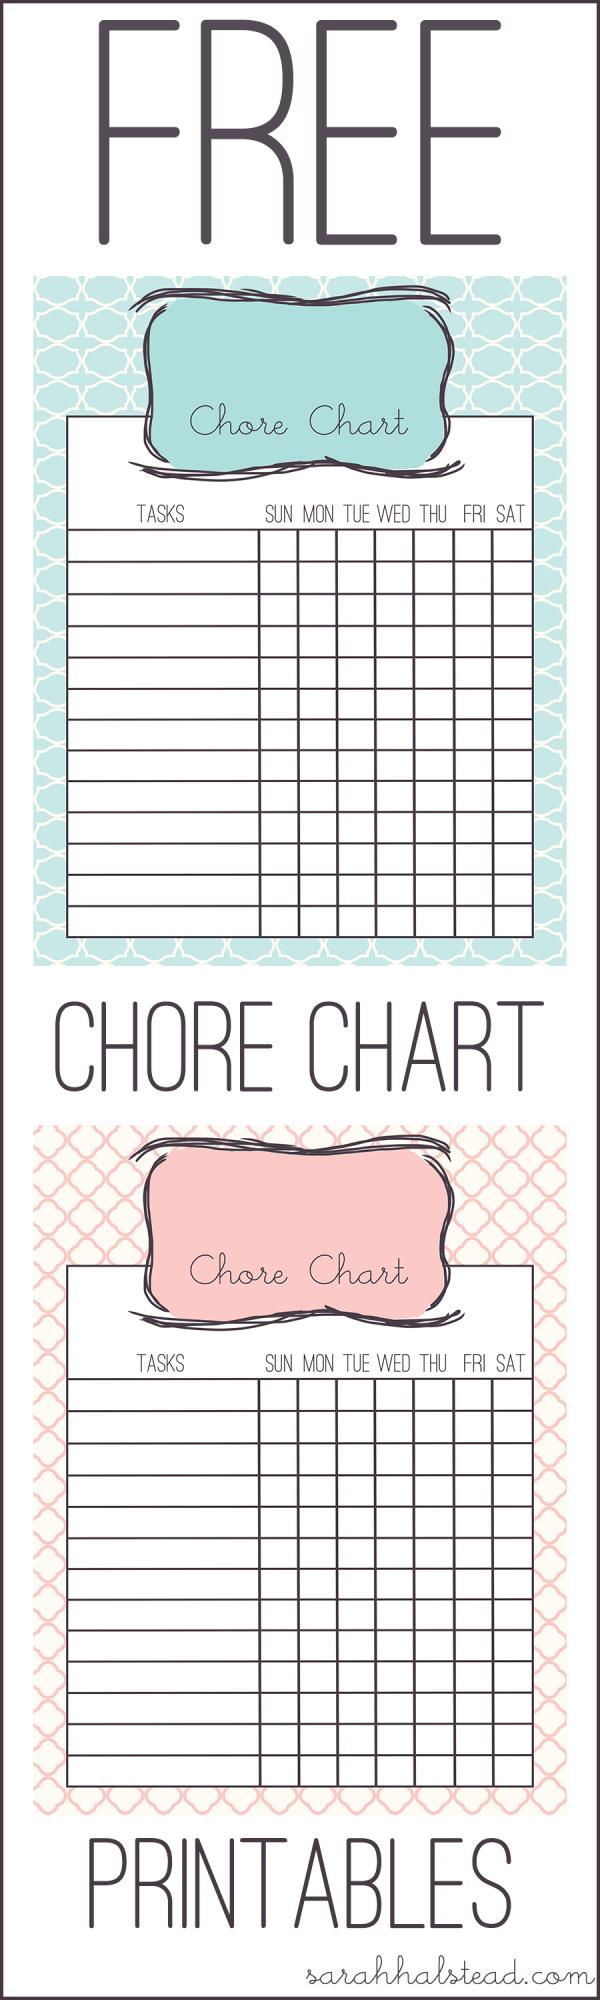 Chore Chart Free Printable  Free Printable Chore Charts